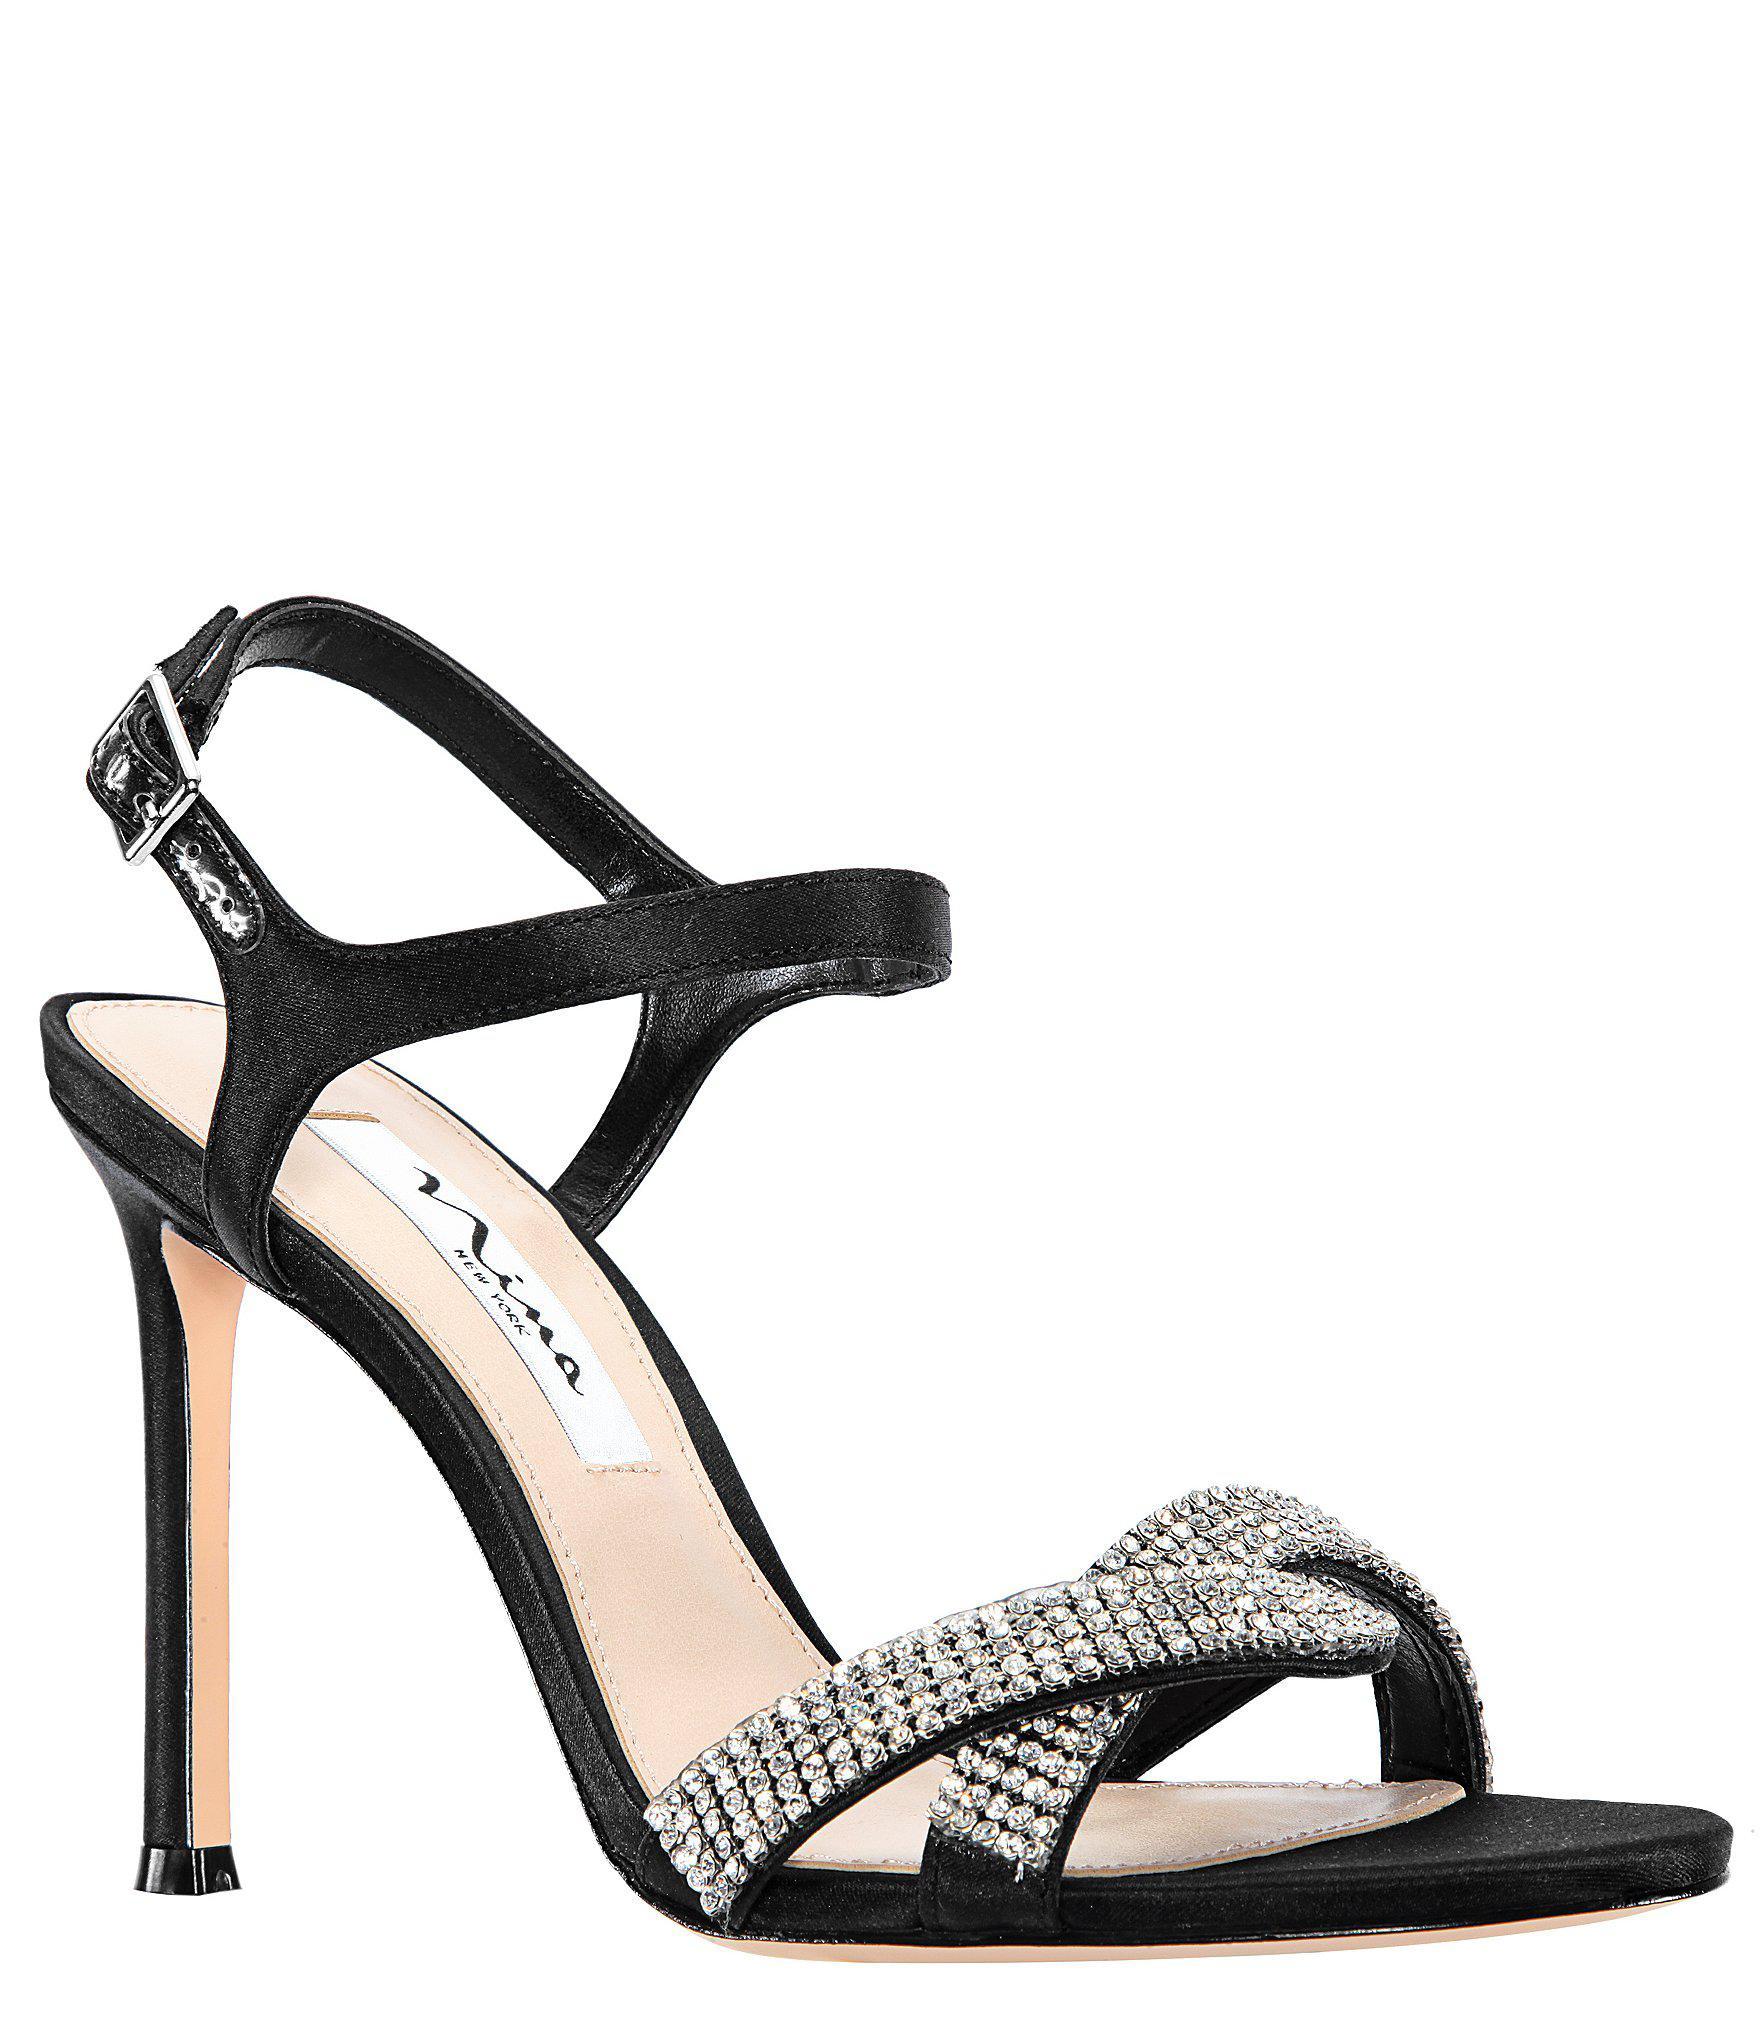 2a4b778a449e7d Lyst - Nina Davia Satin And Rhinestone Dress Sandals in Black